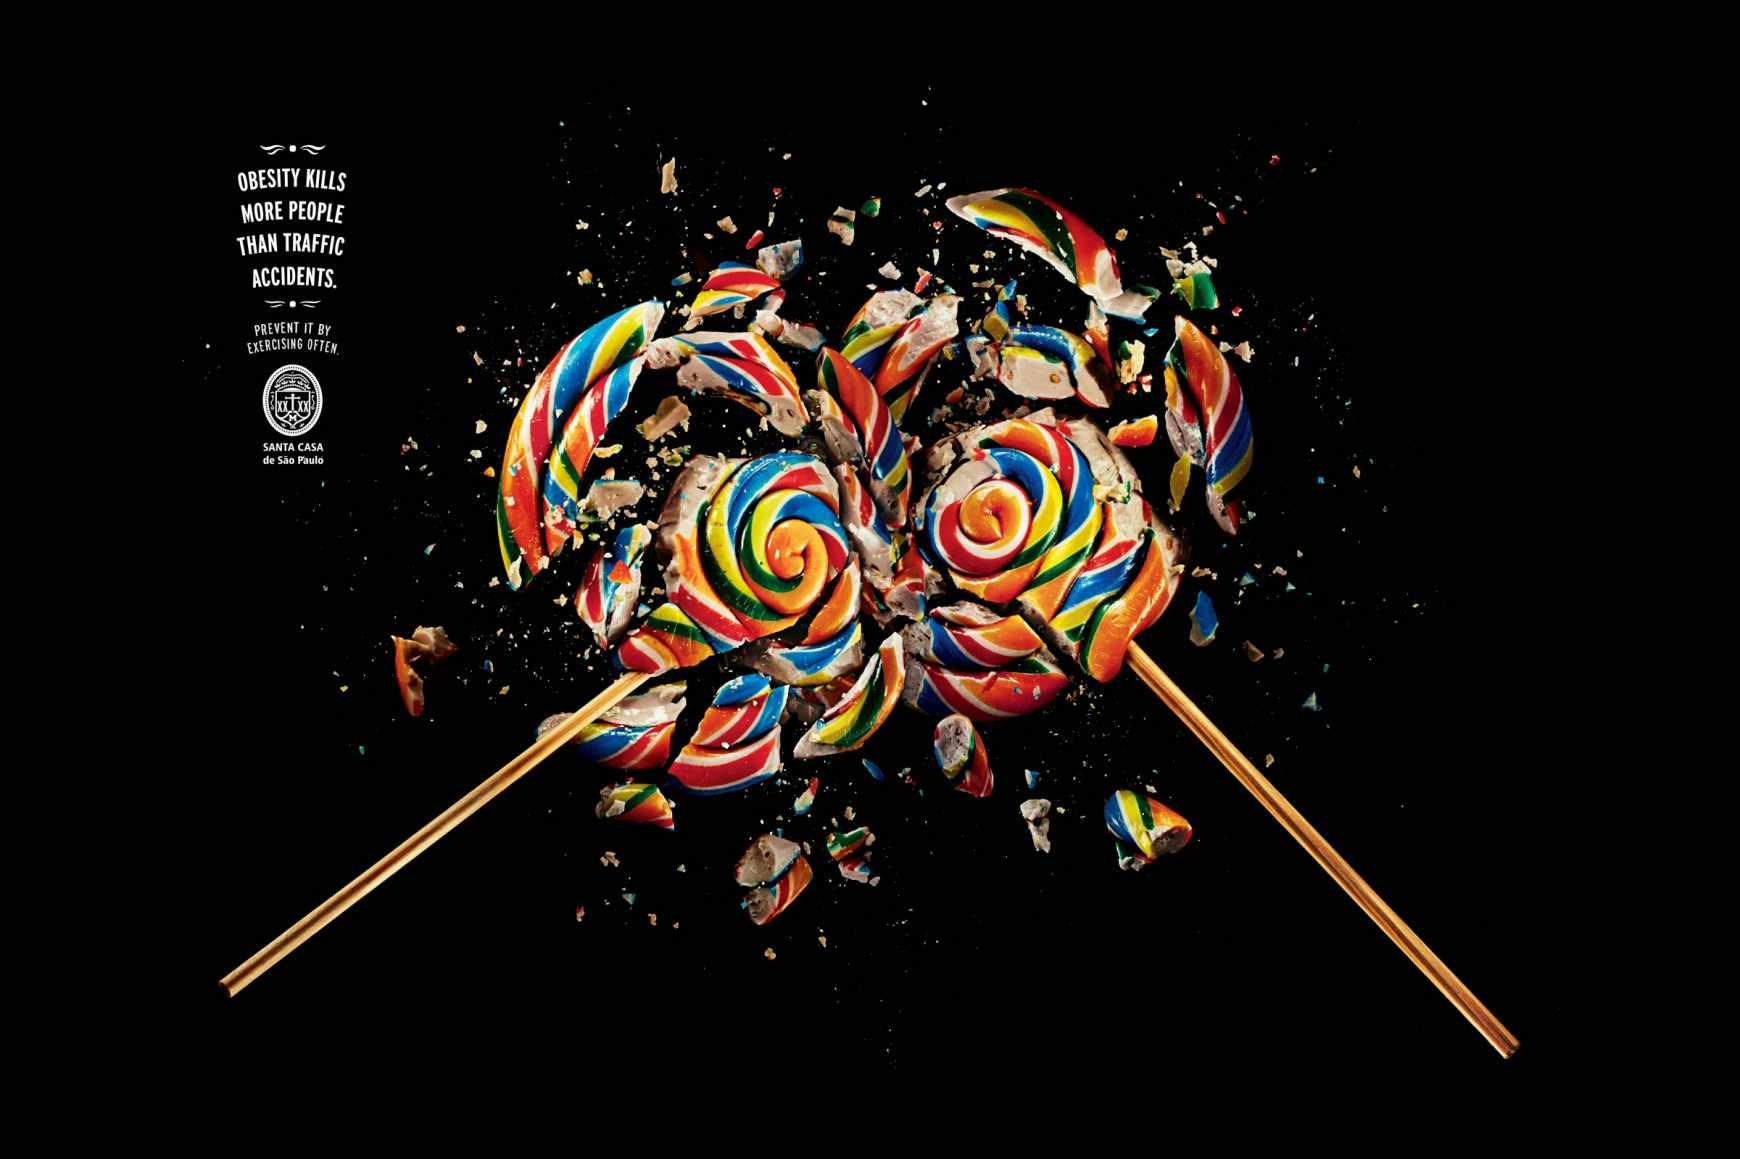 lollypop_aotw